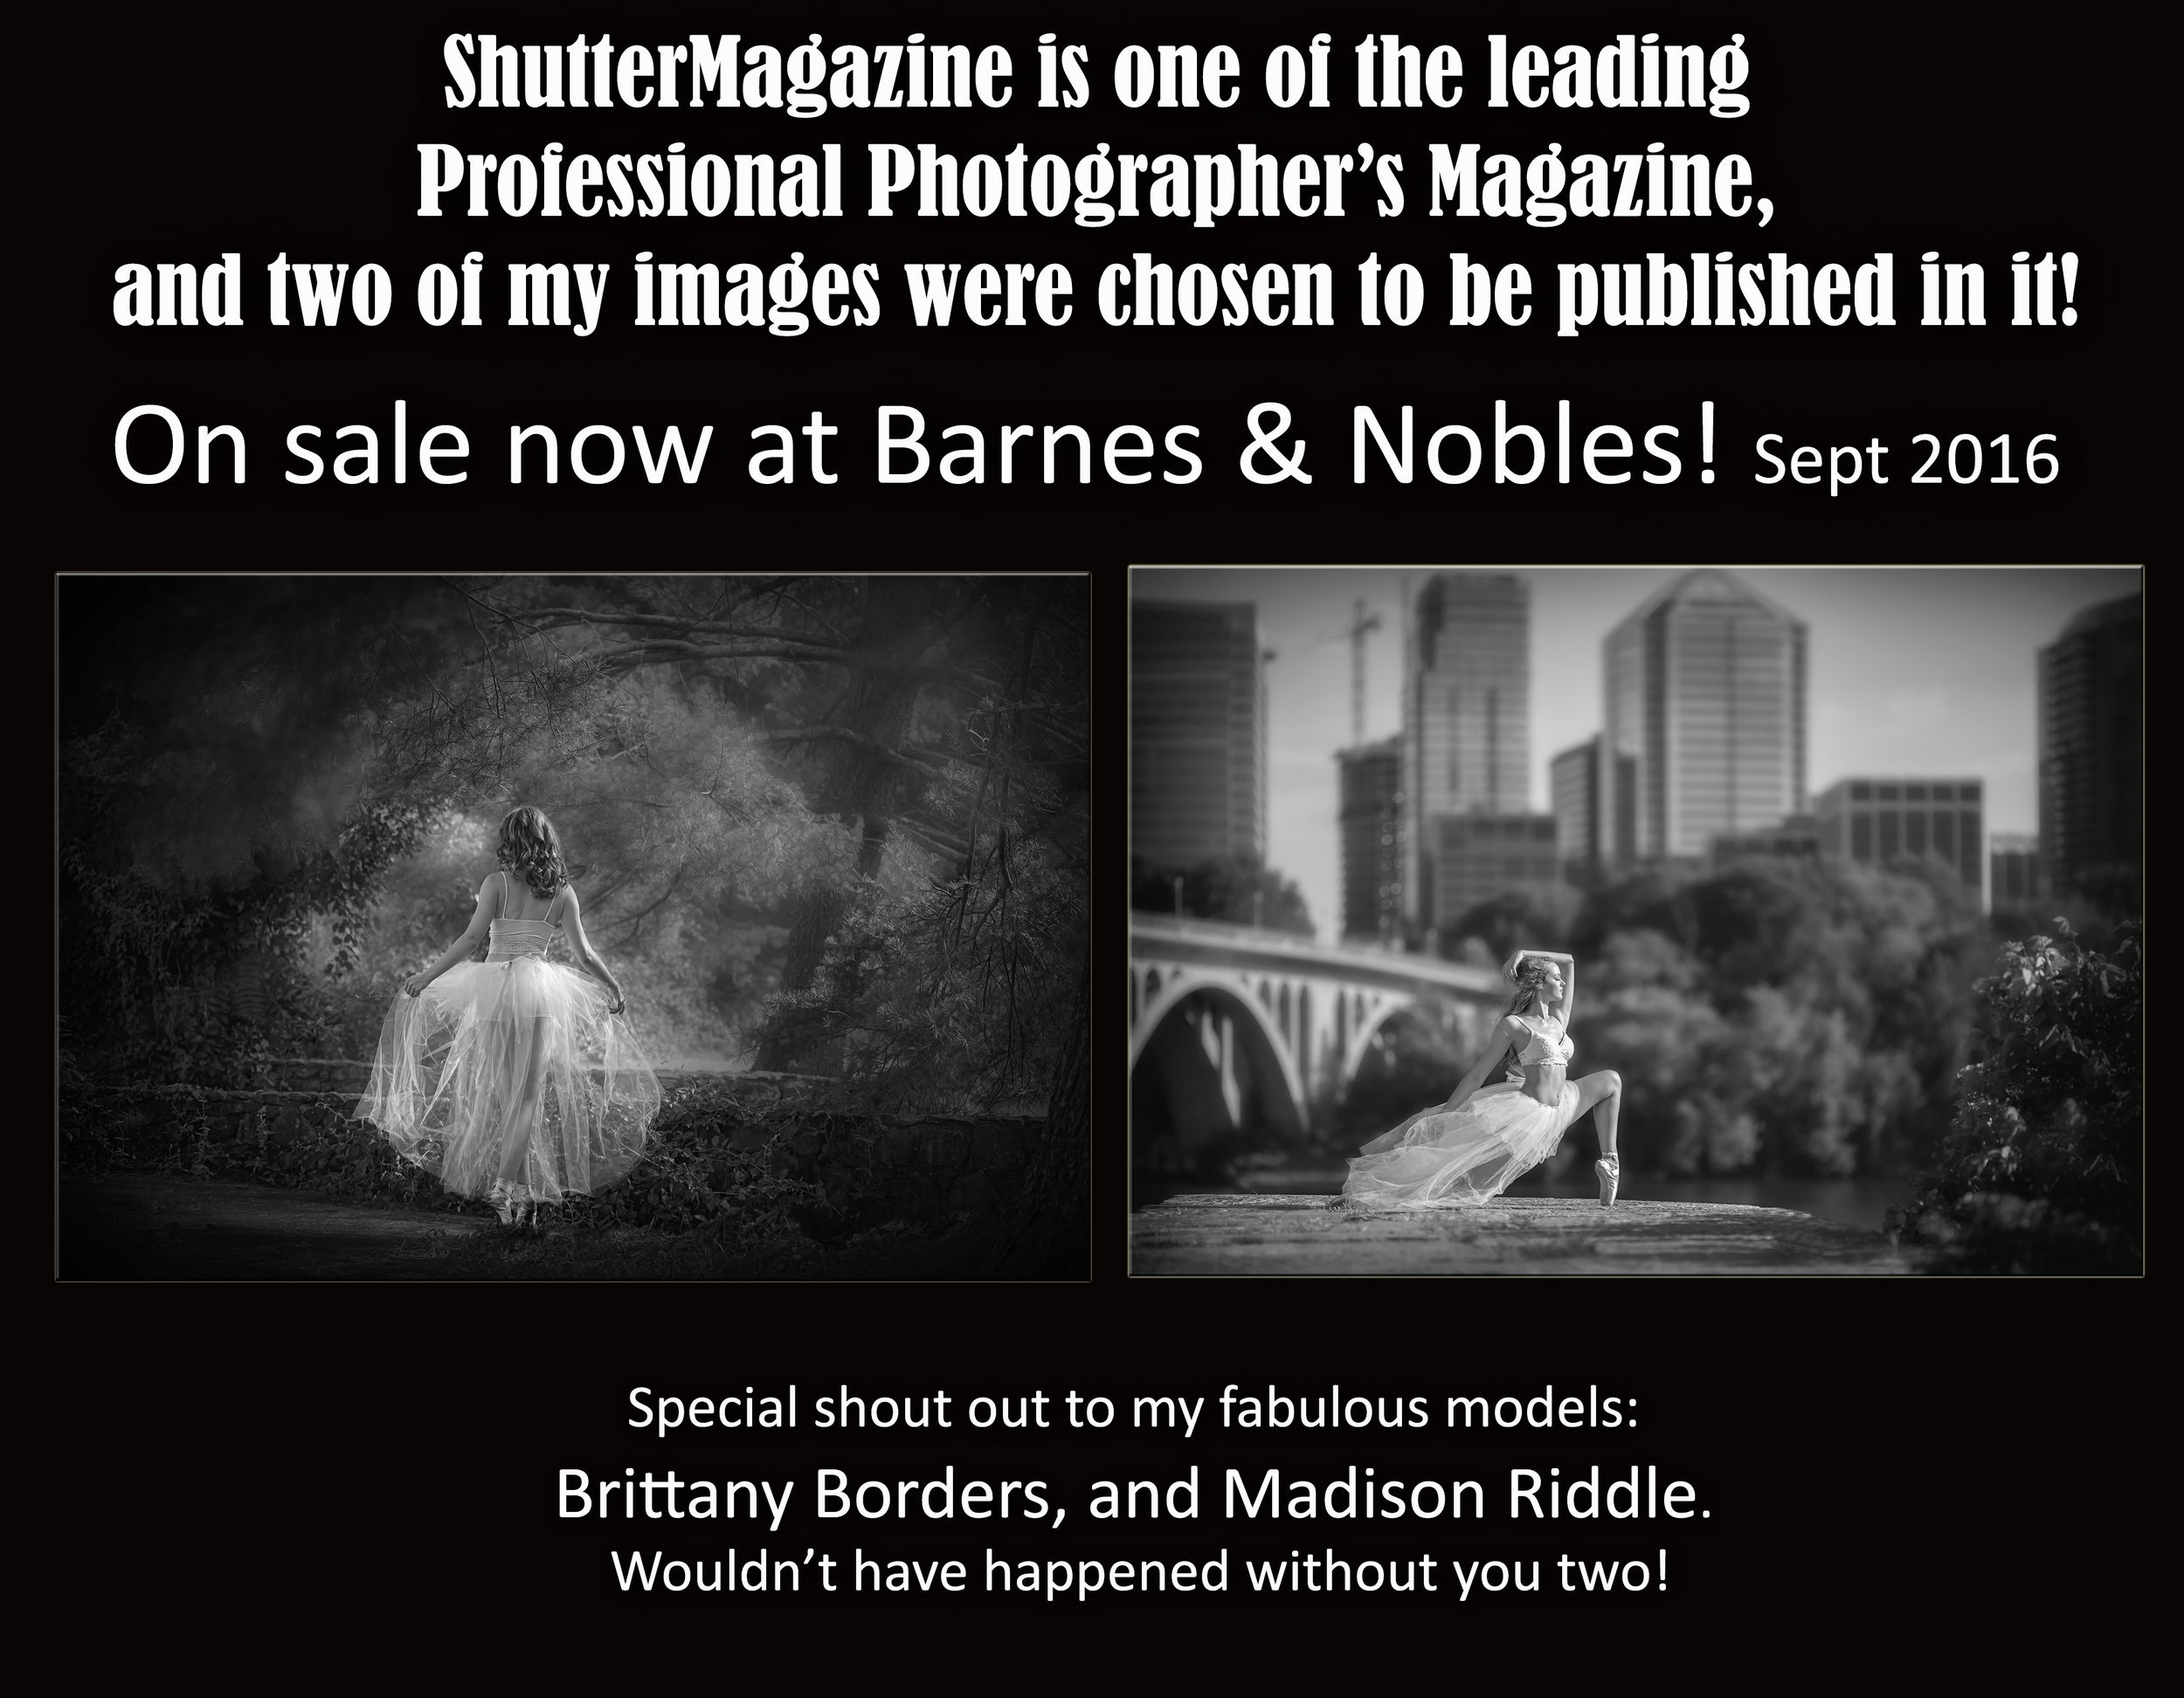 International Publication, Shutter Magazine Sept, 2016 Black & White issue. Two images selected!